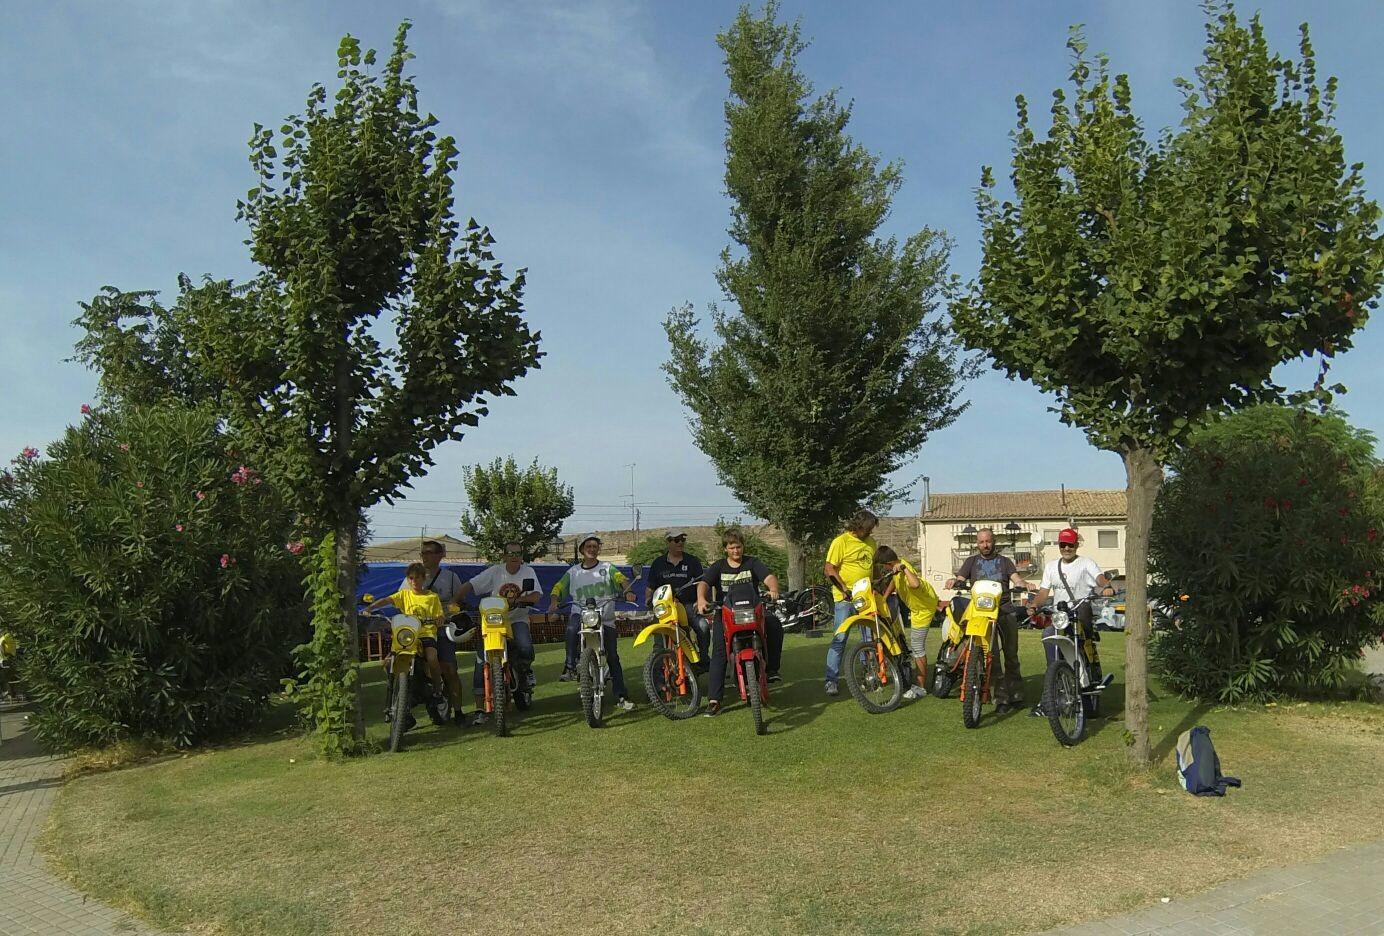 XI concentracion de motos antiguas en Alberuela de tubo (Huesca) 2lsjhtx